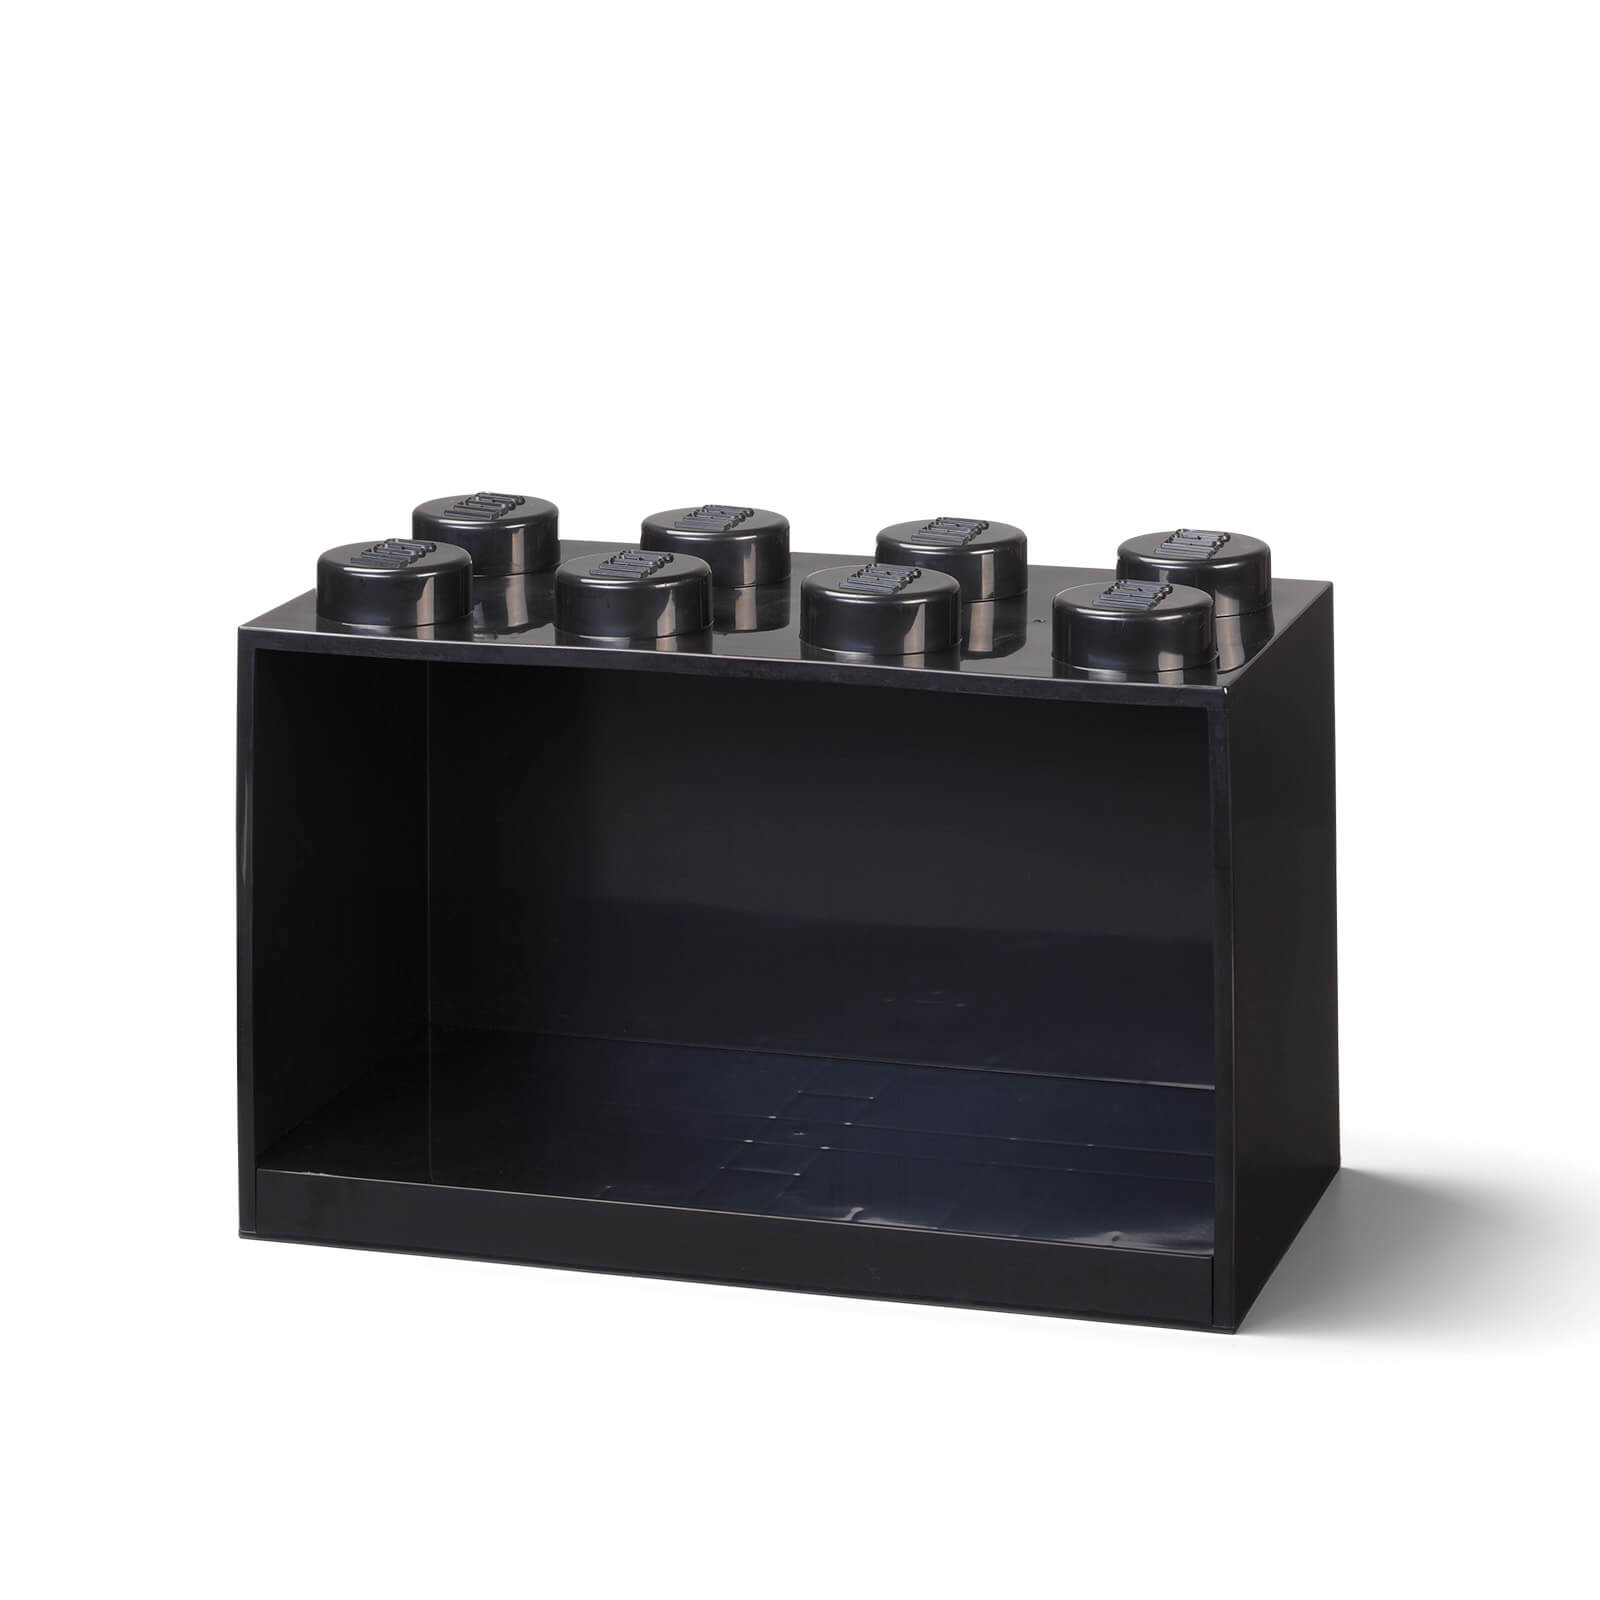 Image of LEGO Storage Brick Shelf 8 - Black